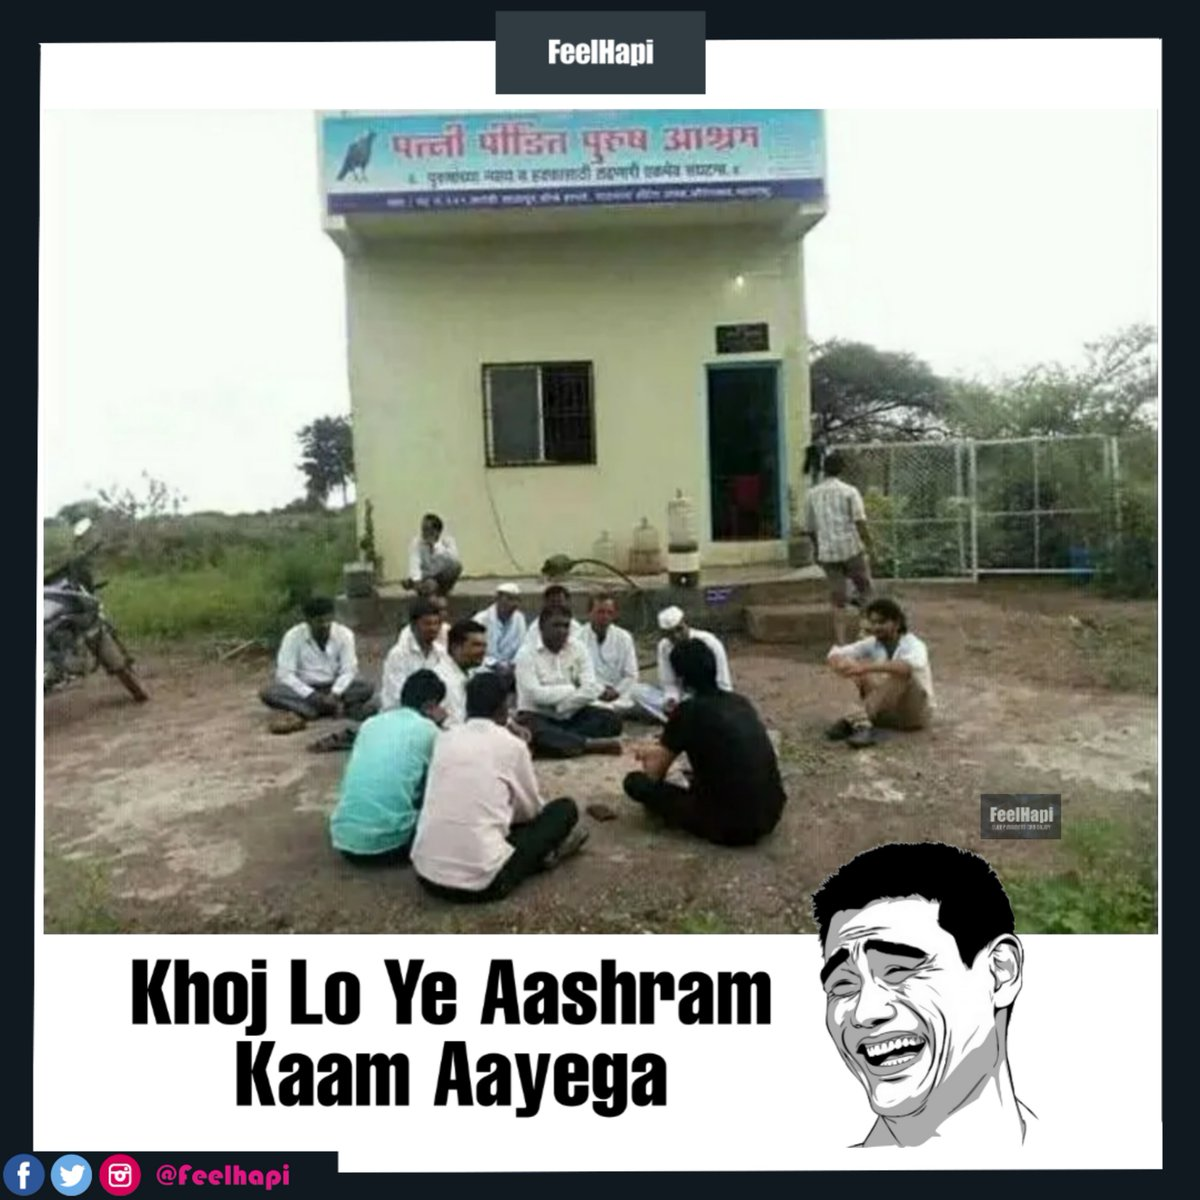 Pati Ki peeda pati hi jaane  . . #feelhapi #patipatni #husbandwife #jokeskhatarnak #jokeshindi #chutkule #jokes #khatarnakjokes #jokeshijokes #funnyjokes #hindijokes #instadesi #indianjokes #desijokes #dailypost #dheemedheeme #trending #channle #youtube #dancecover #manpic.twitter.com/LuzZfxag9J